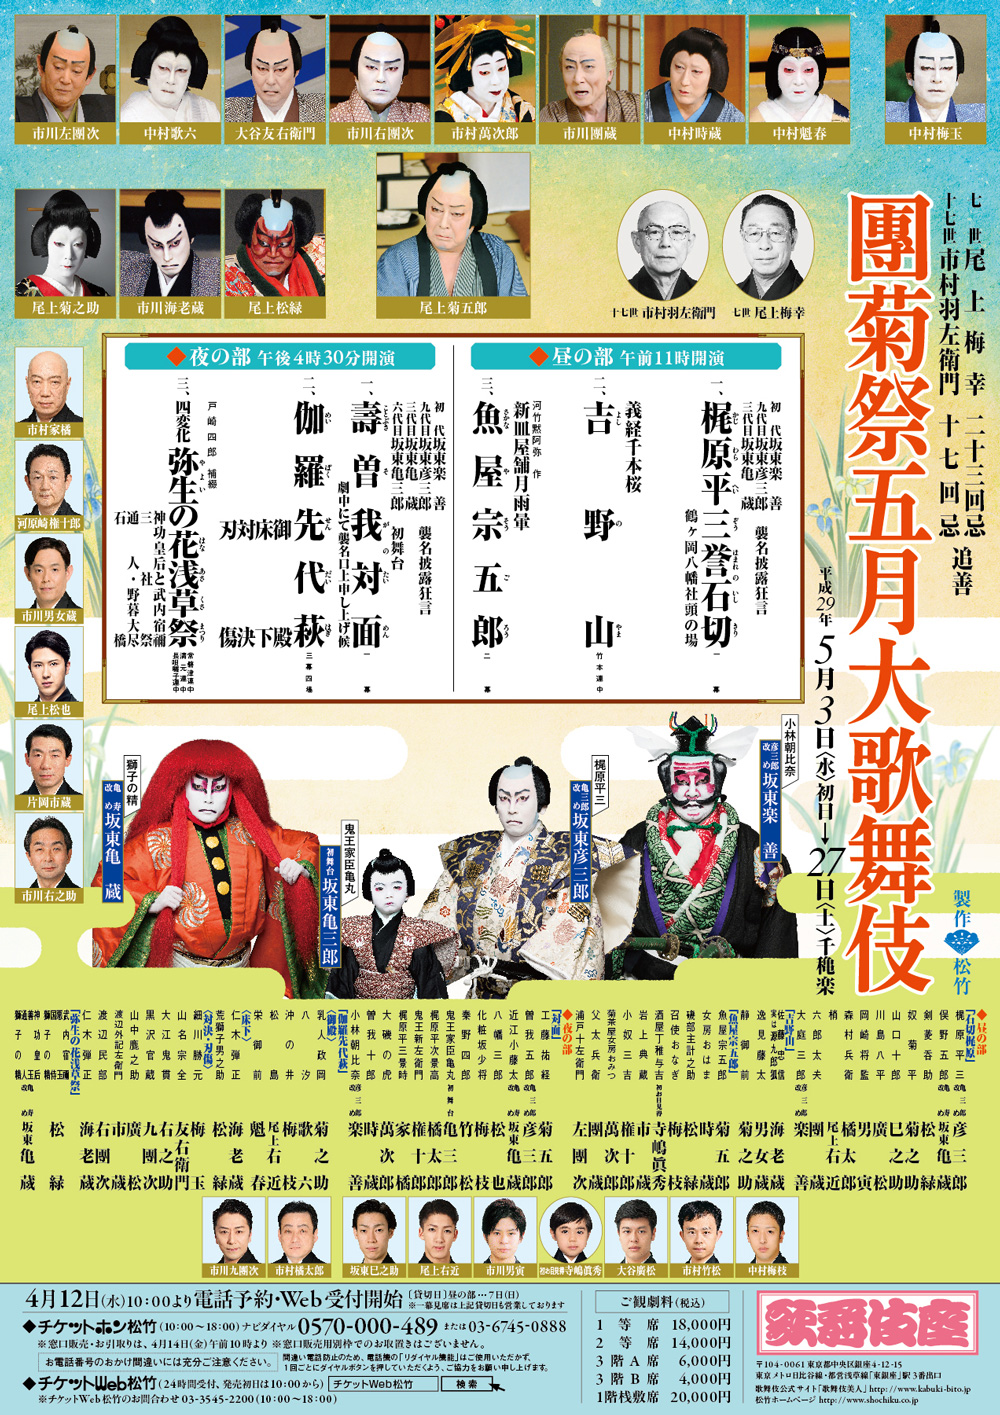 http://www.kabuki-bito.jp/uploads/images/kouen/518/kabukiza_201705fff_6eed1d26d3b89aad73b6d6622f4da399.jpg